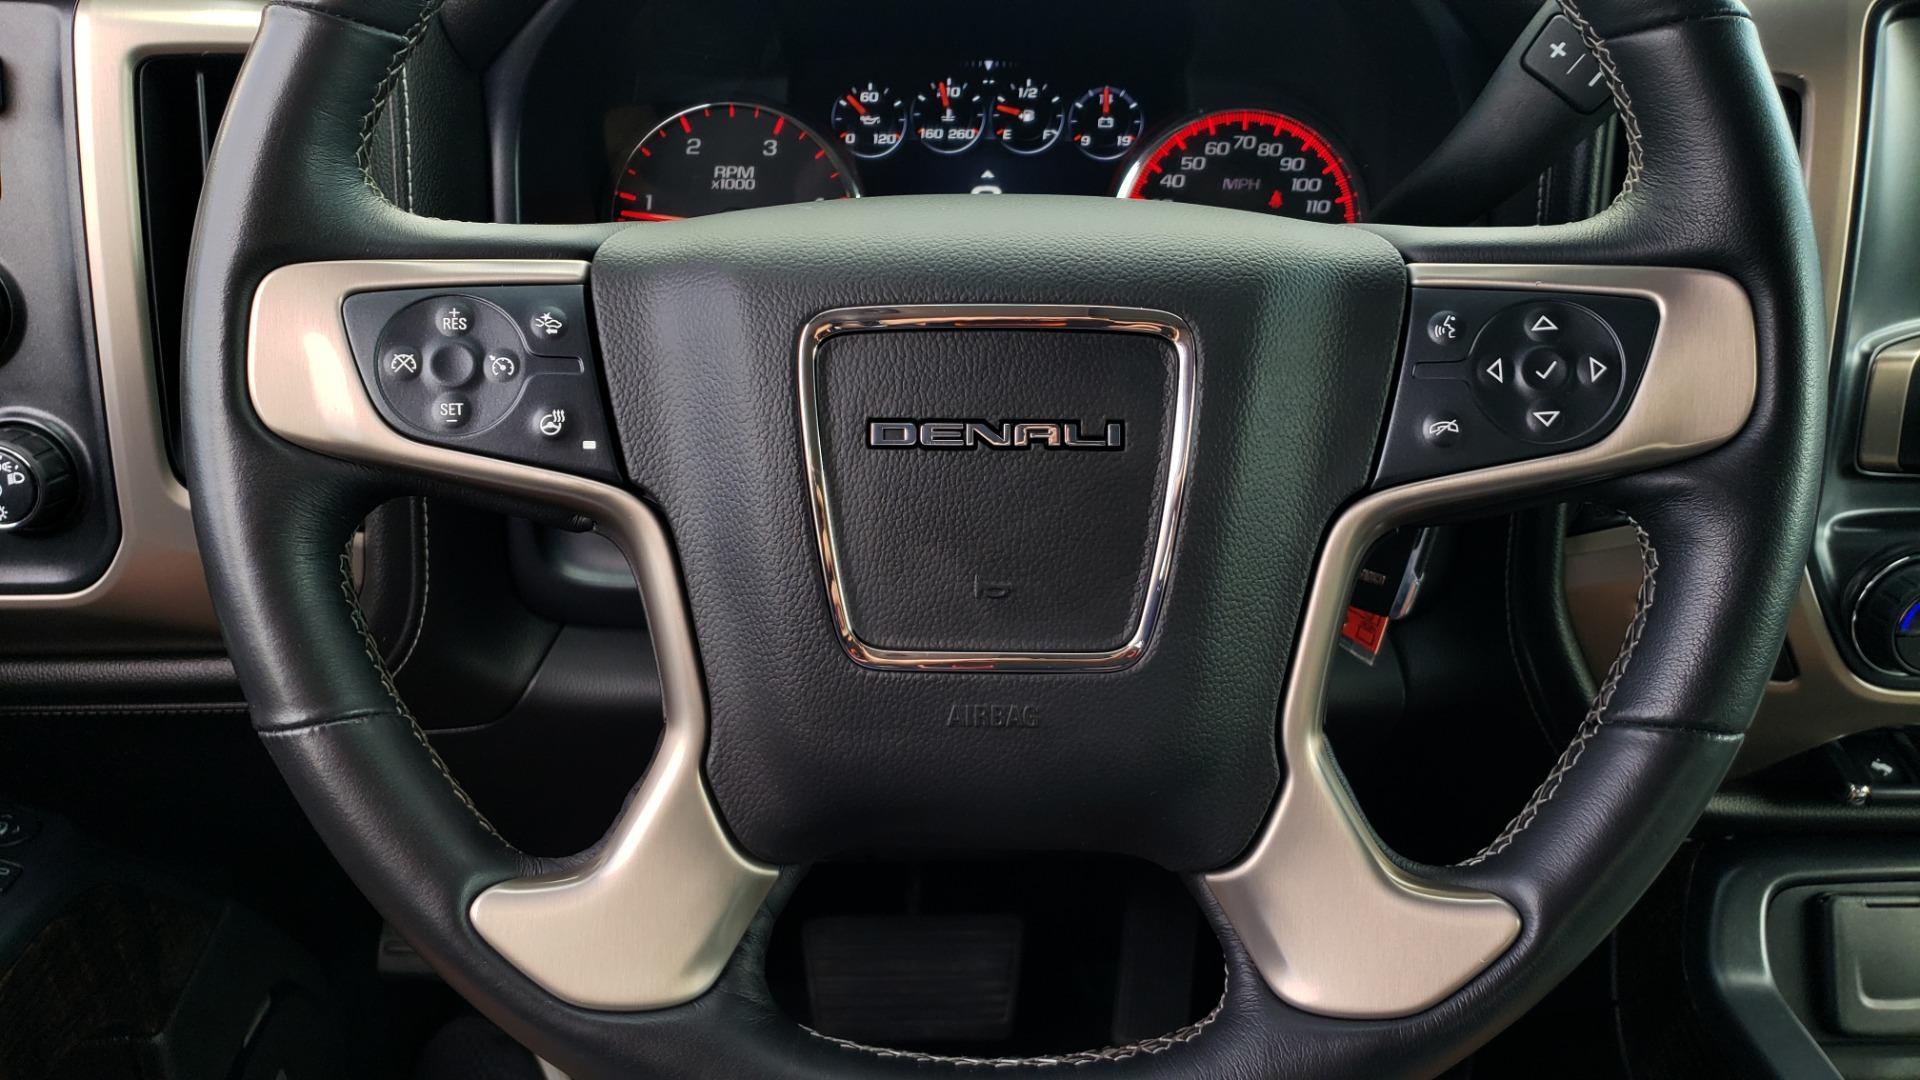 Used 2015 GMC SIERRA 2500HD DENALI / WIFI / NAV / DURAMAX PLUS / DRVR ALERT / SUNROOF / REARVIEW for sale $56,995 at Formula Imports in Charlotte NC 28227 34